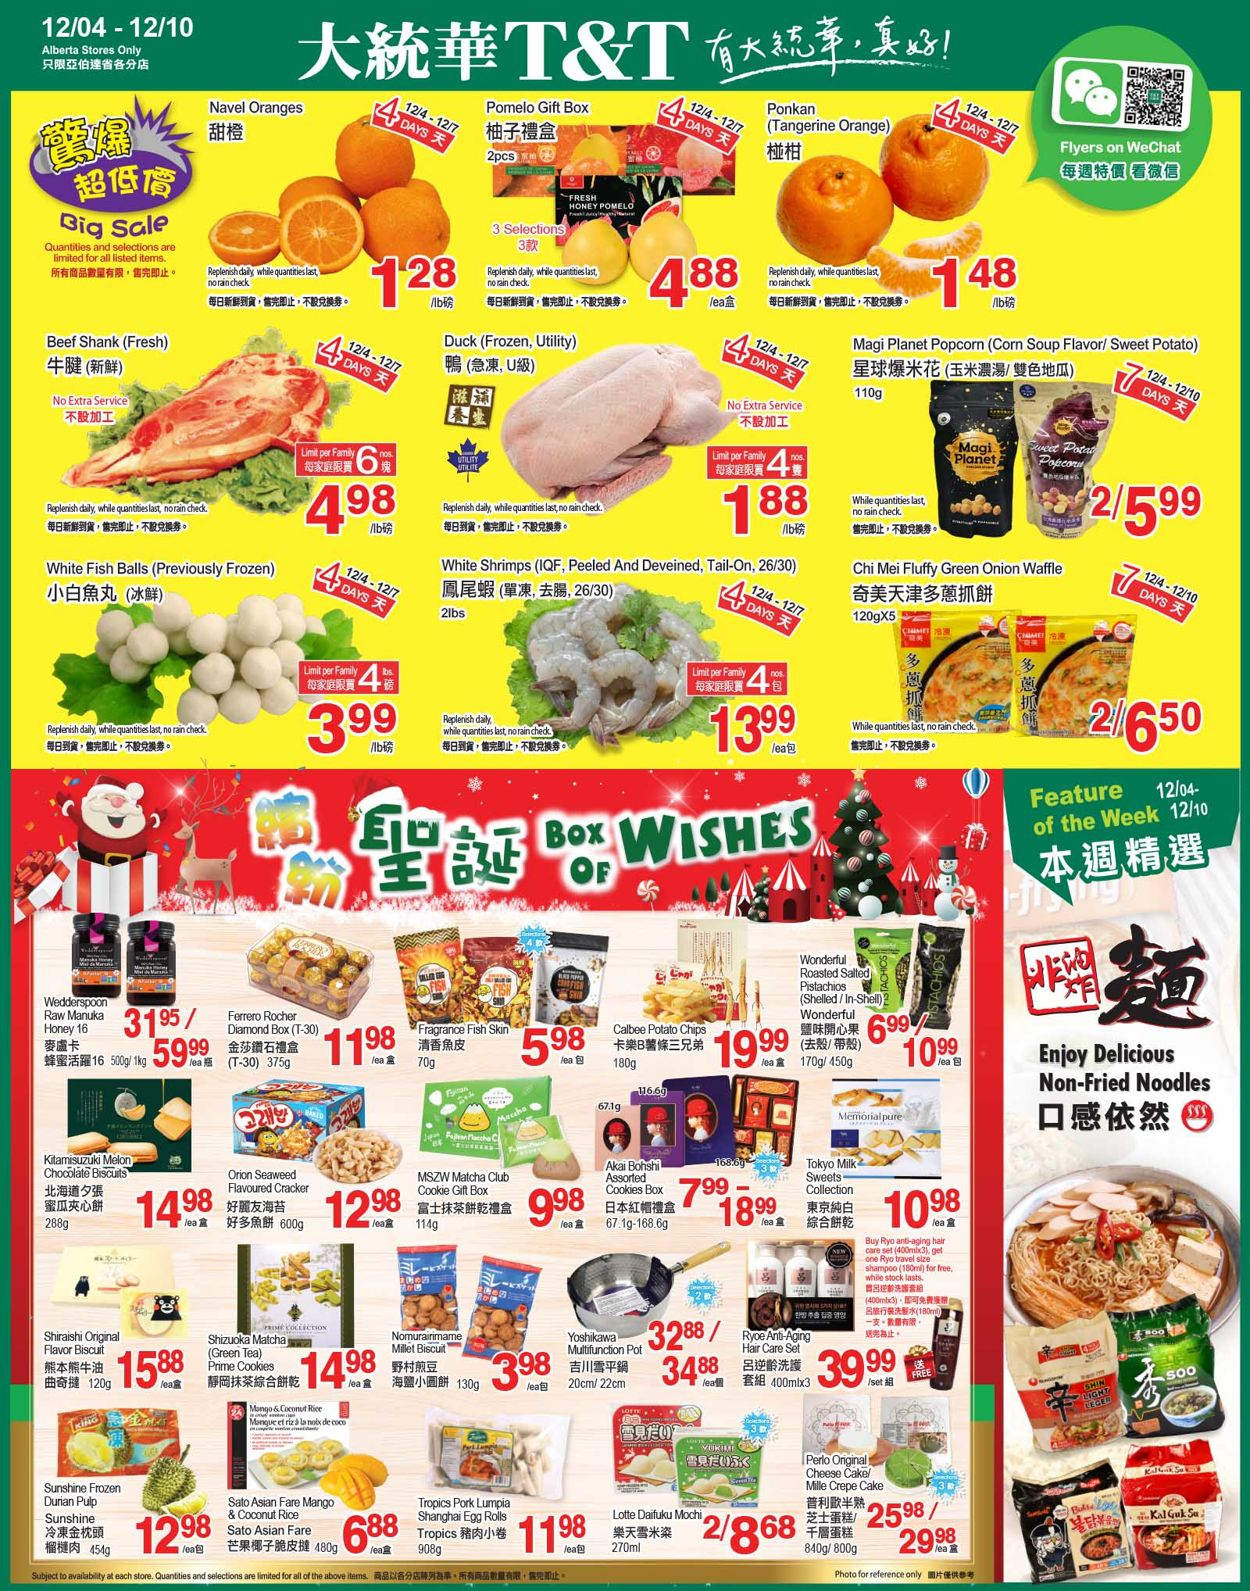 T&T Supermarket Christmas 2020 - Alberta Flyer - 12/04-12/10/2020